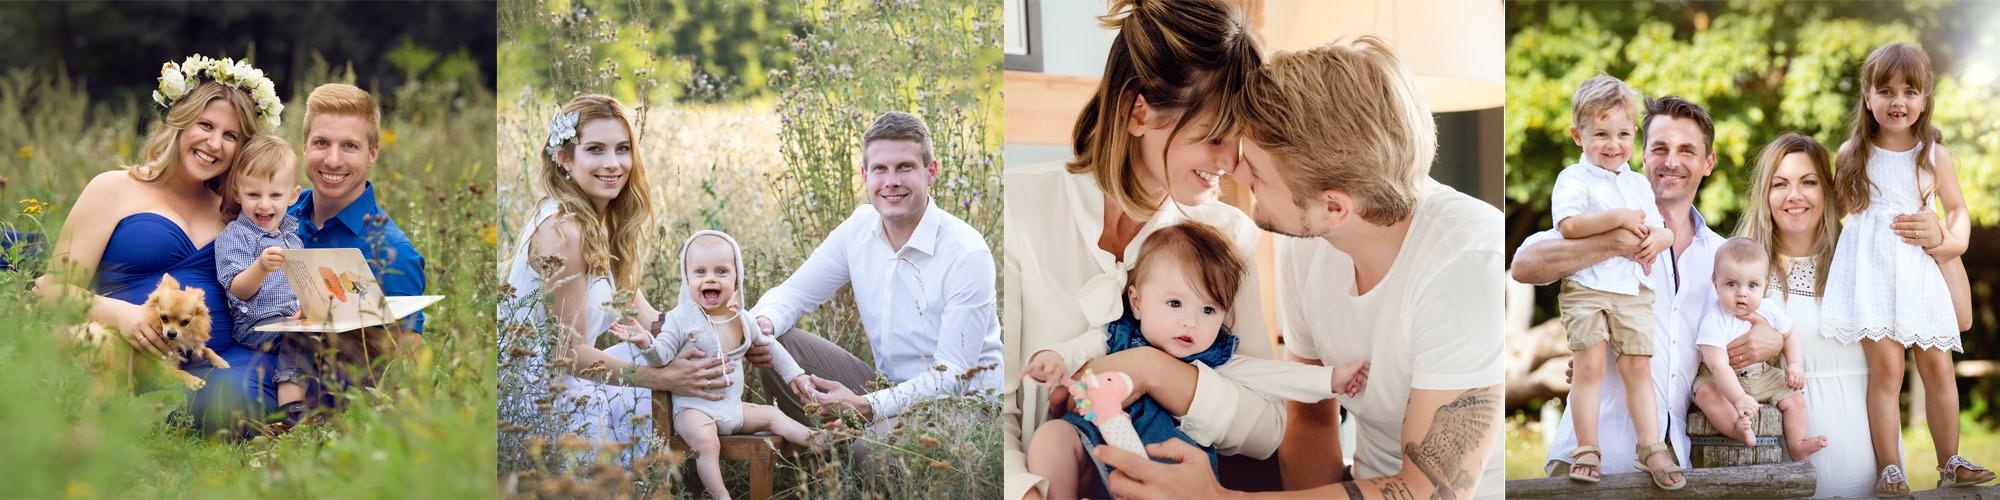 familienfotografie-in berlin-und-familienshooting-in der-natur